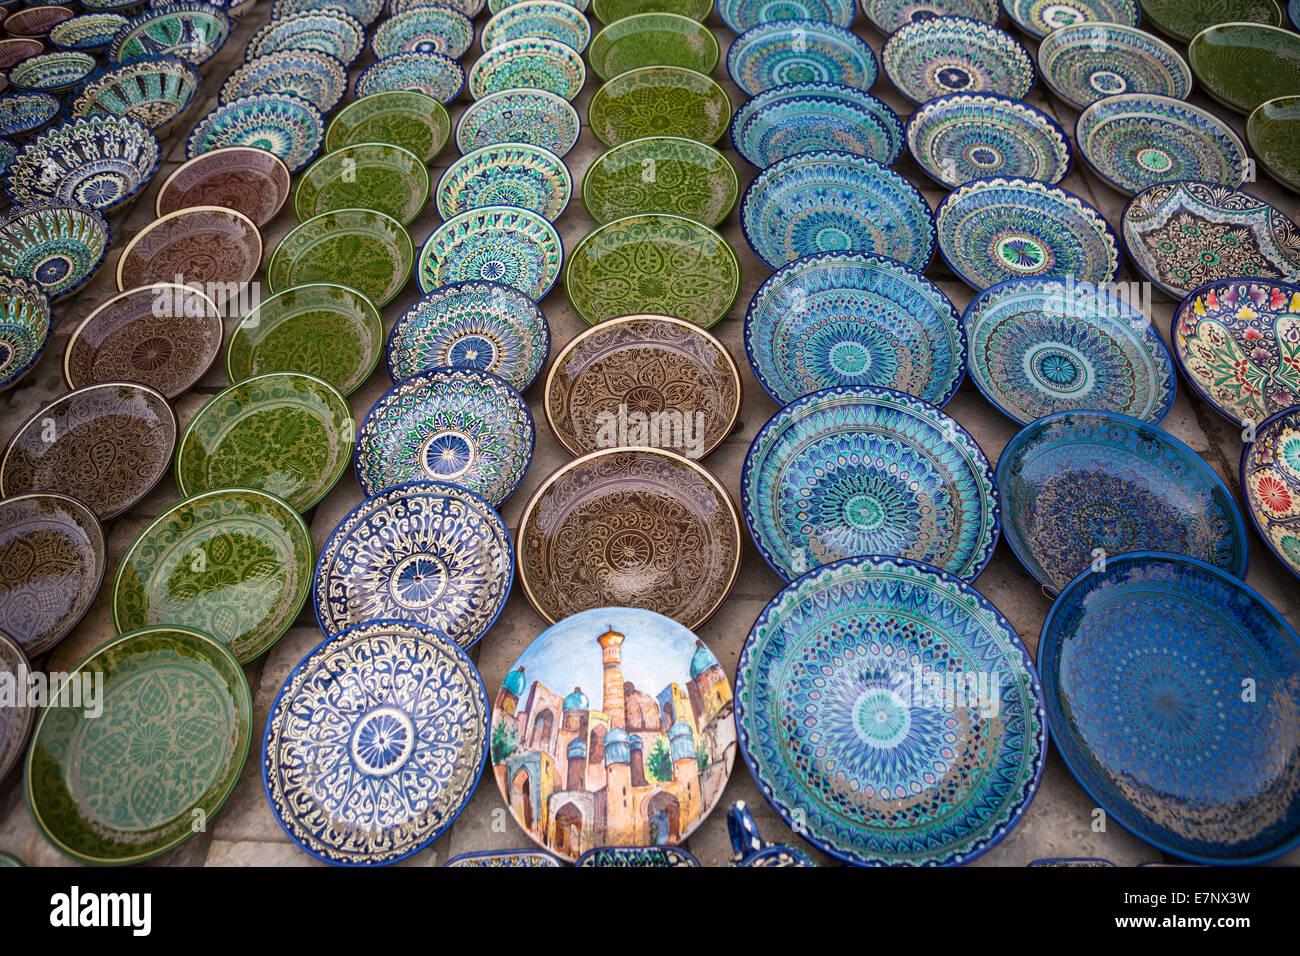 buchara usbekistan zentralasien asien keramik stadt bunt geschirr shop seidenstra e. Black Bedroom Furniture Sets. Home Design Ideas